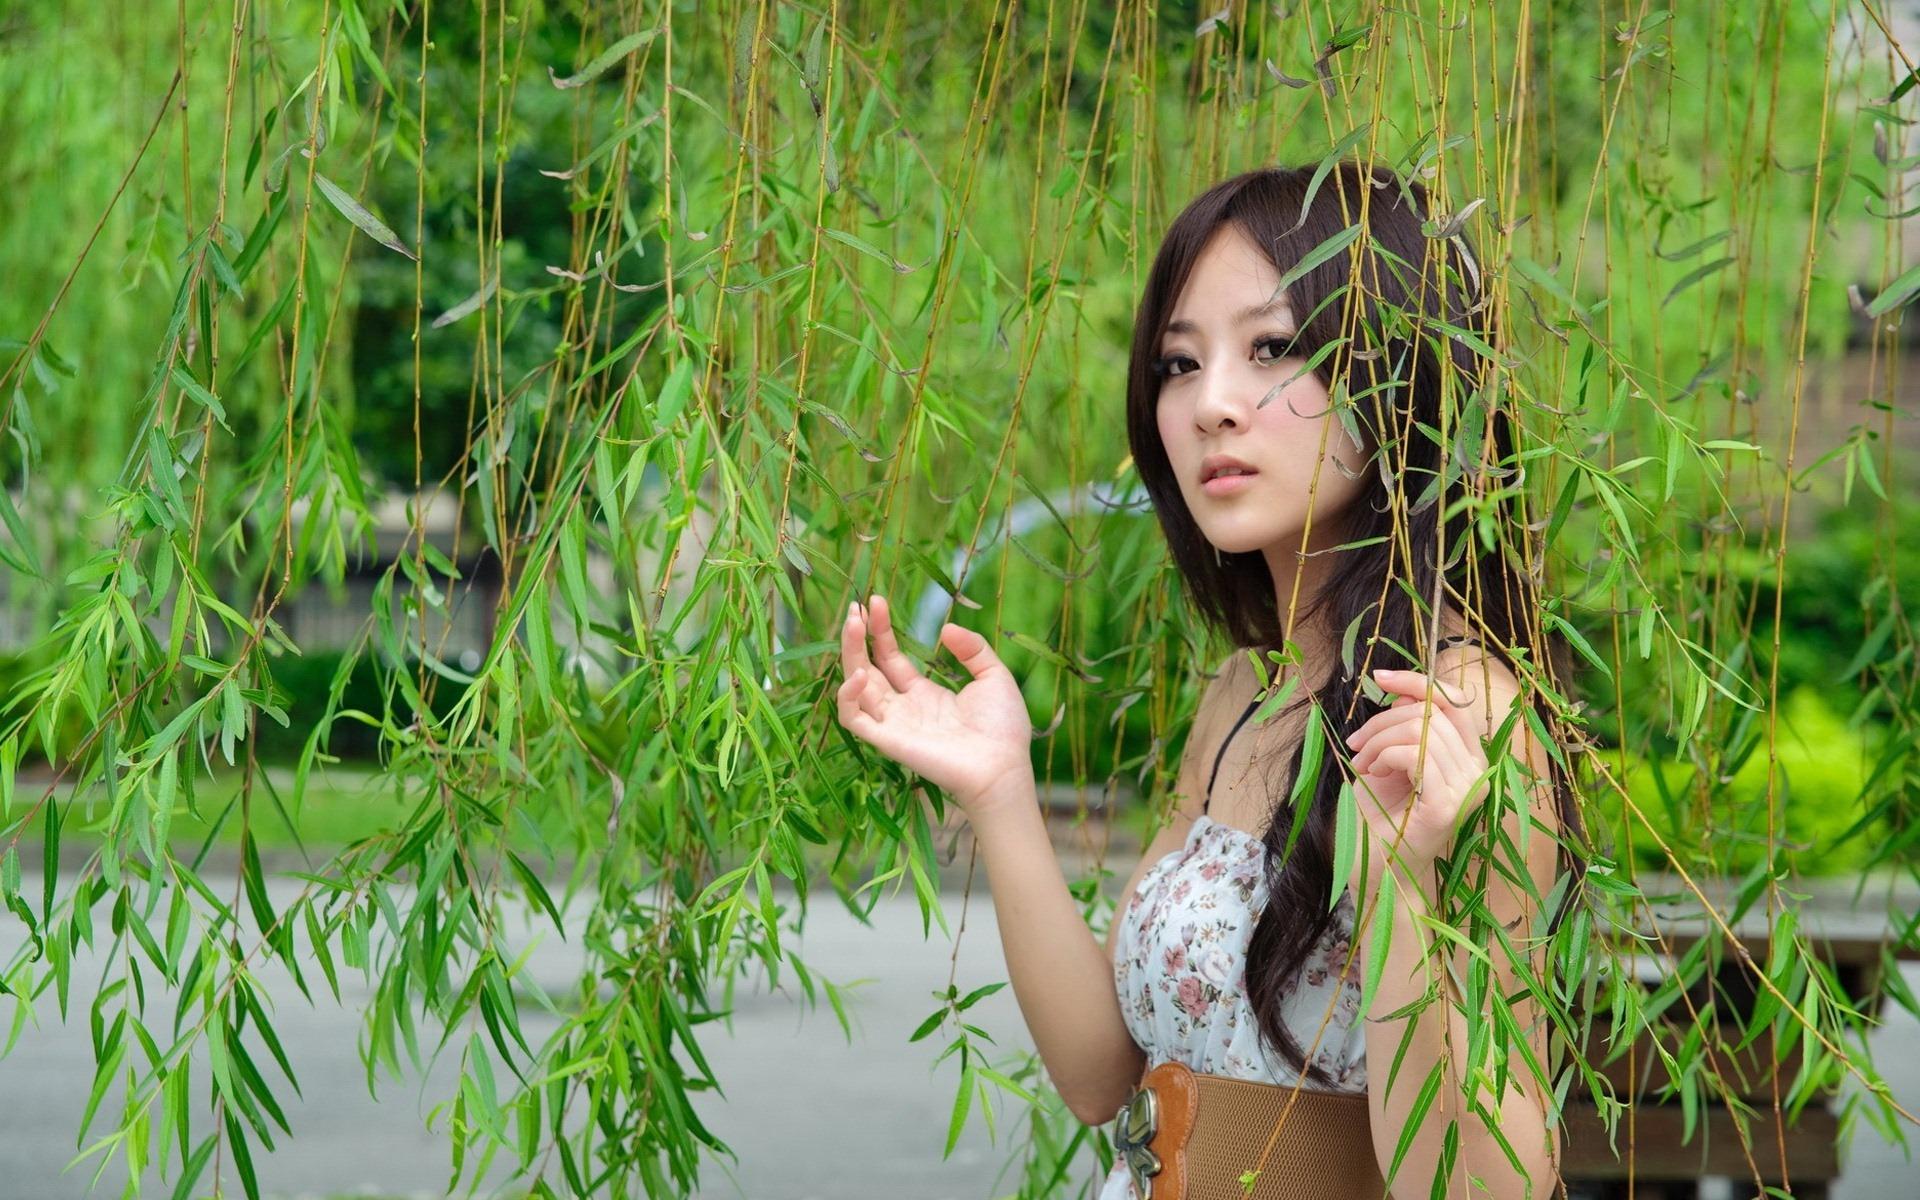 Beautiful Girl Wallpaper Iphone Mikako Zhang Kaijie Hd Wallpaper Background Image